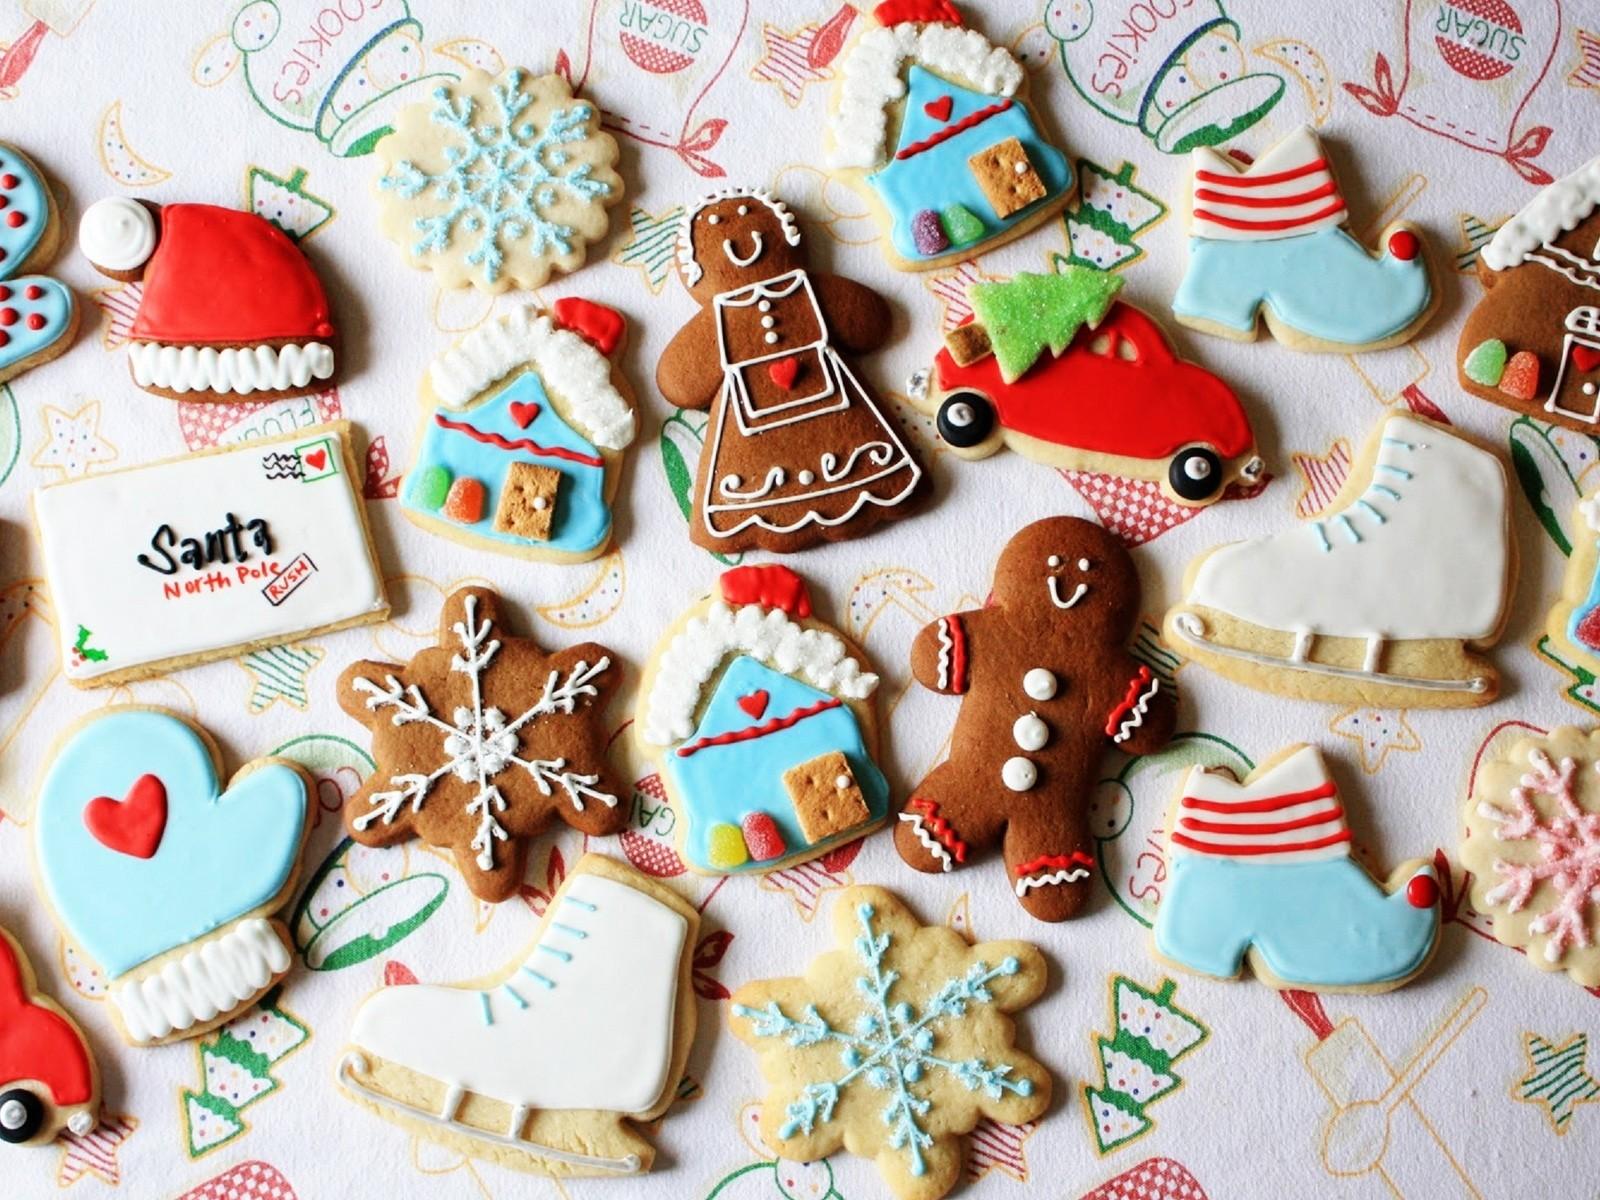 ws_Christmas_sweet_ornaments_1600x1200